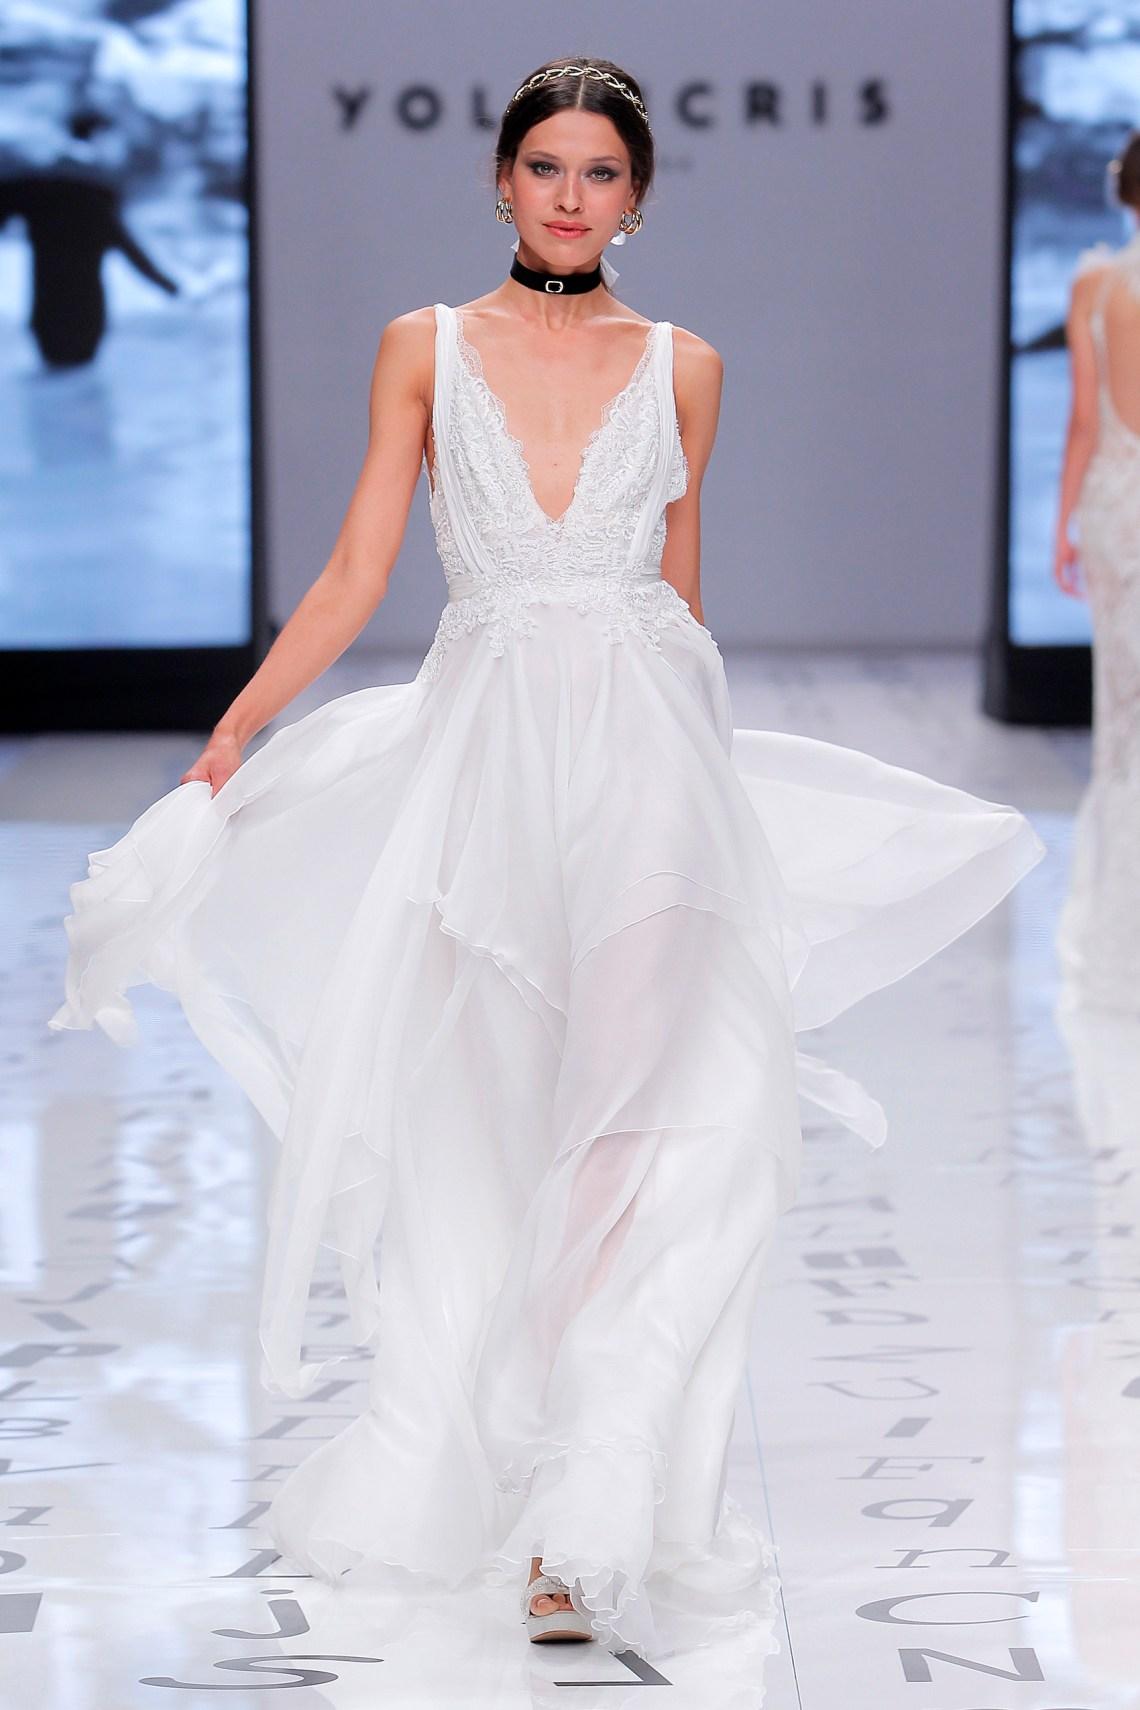 Vestidos de novia YolanCris 2020